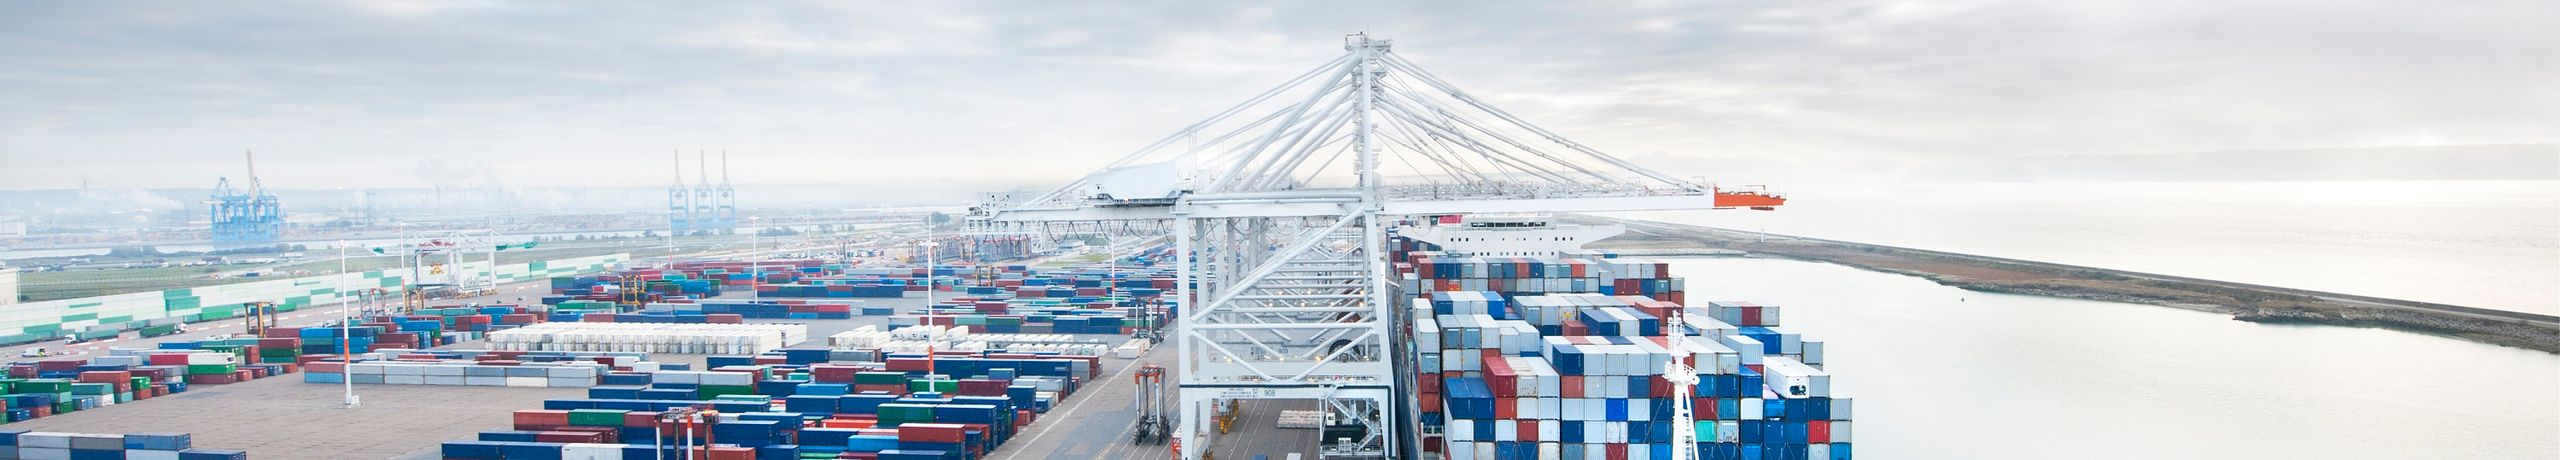 Transport en logistiek glasvezel